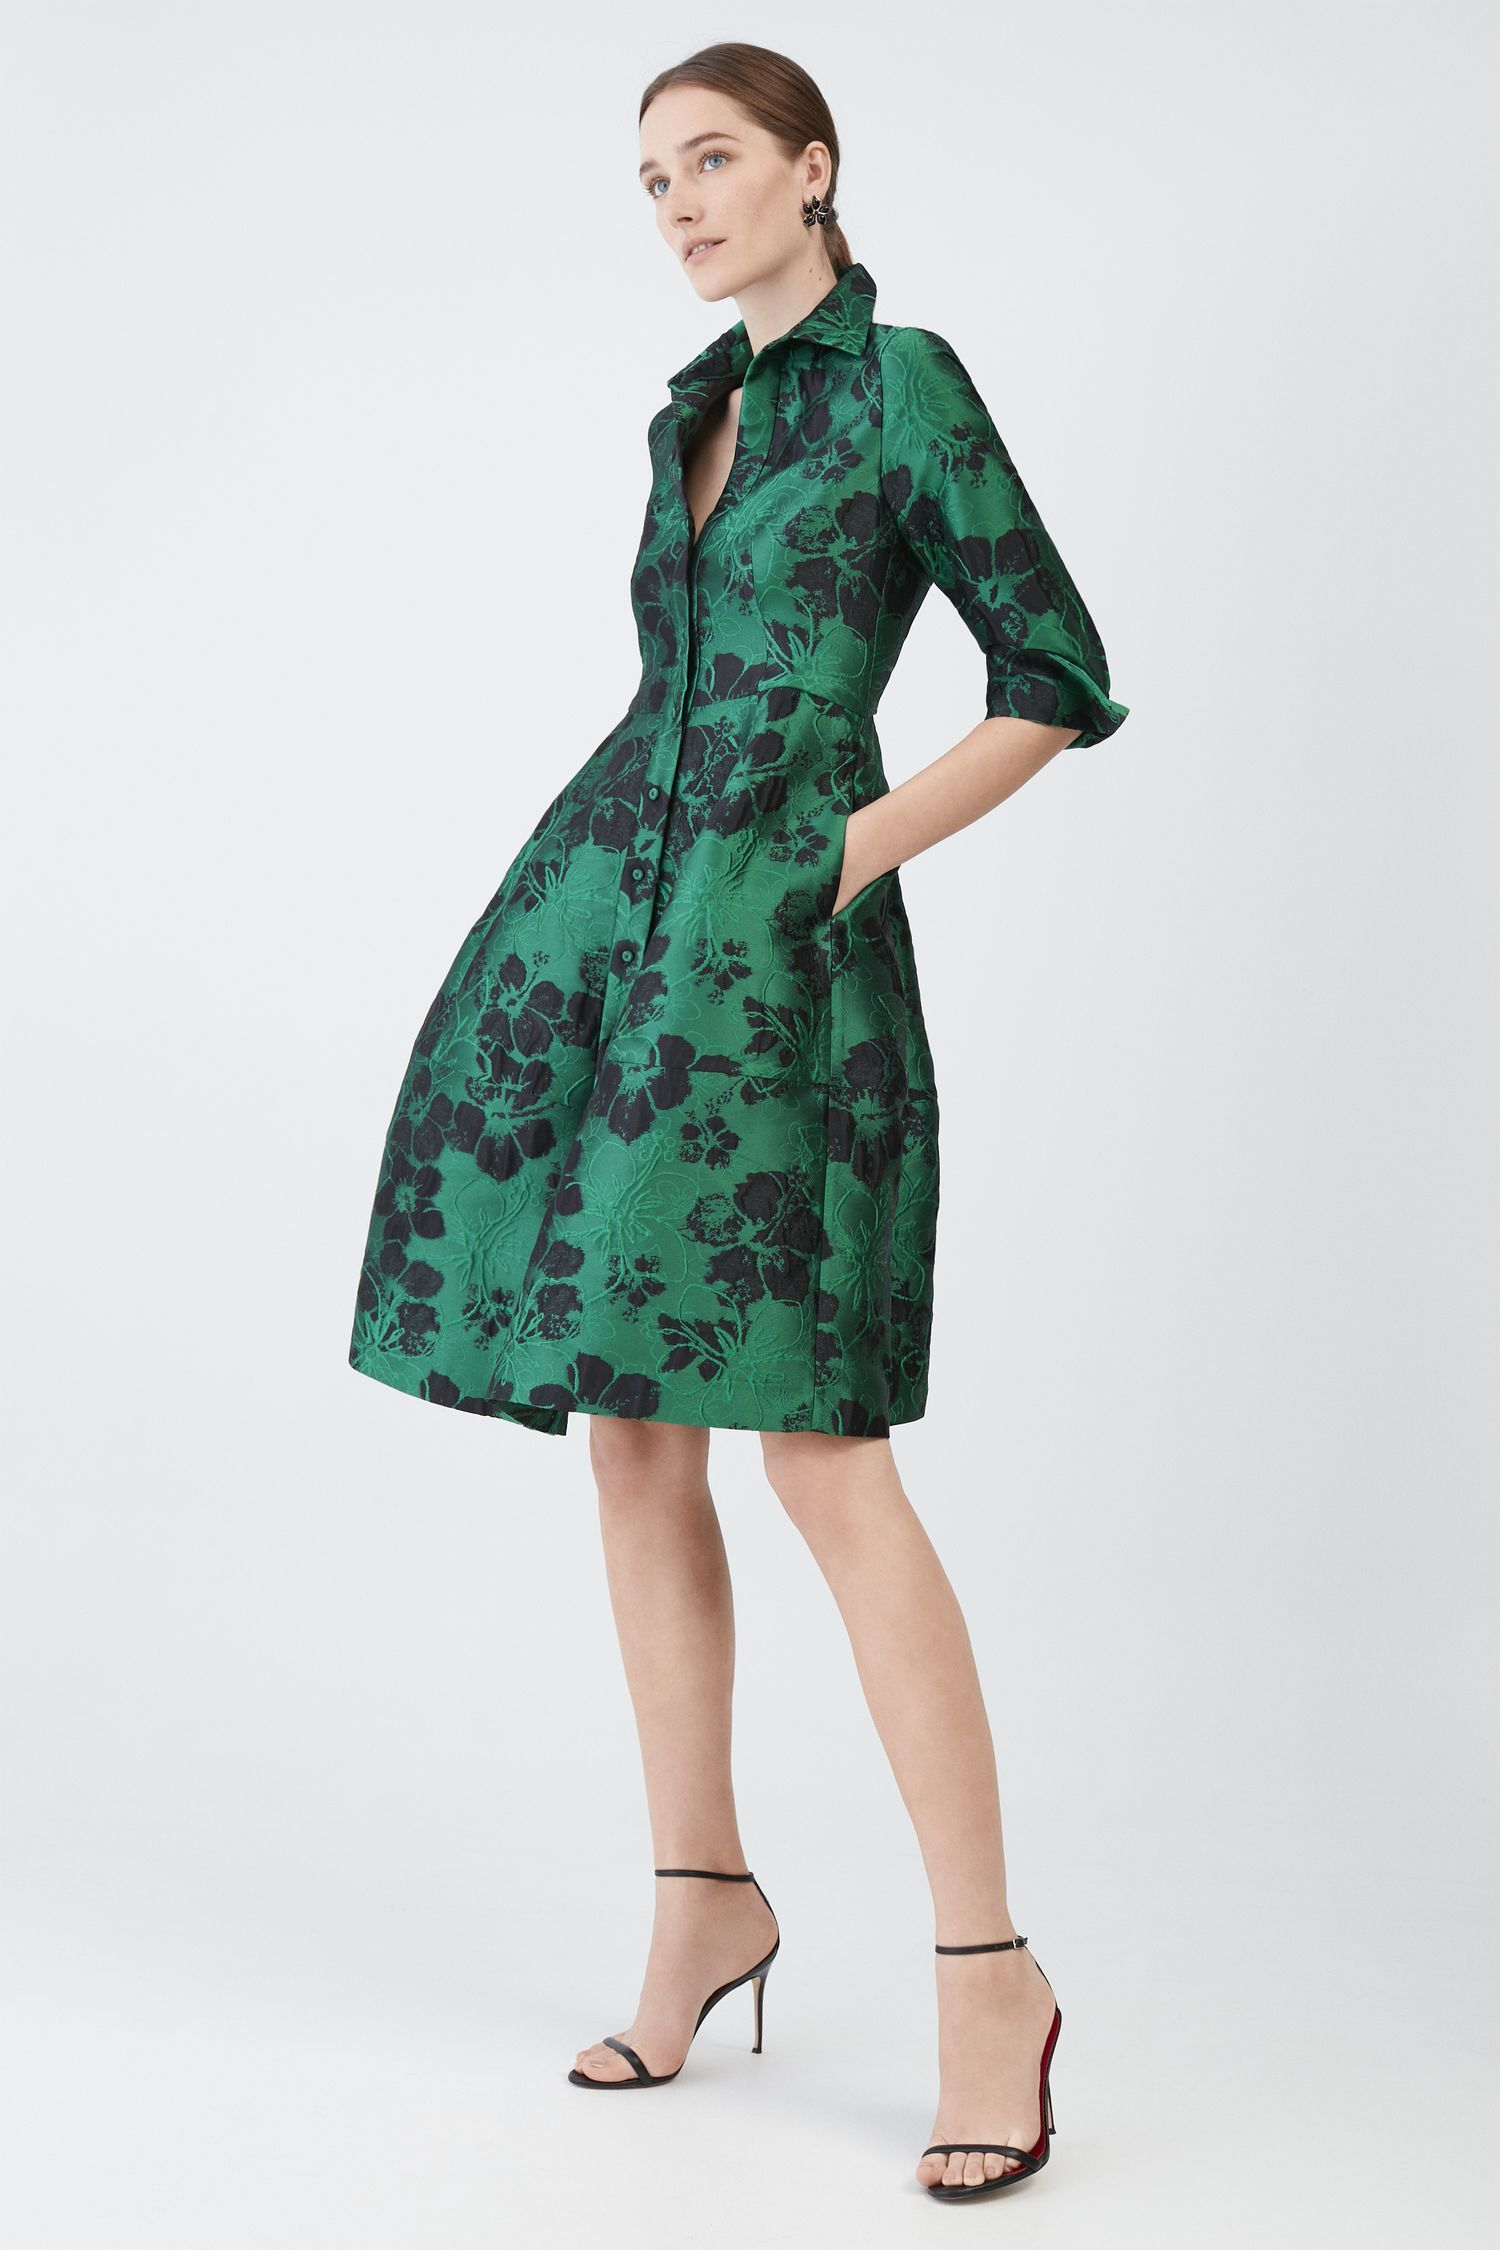 Vestidos Largos Zara Trf Ken Chad Consulting Ltd